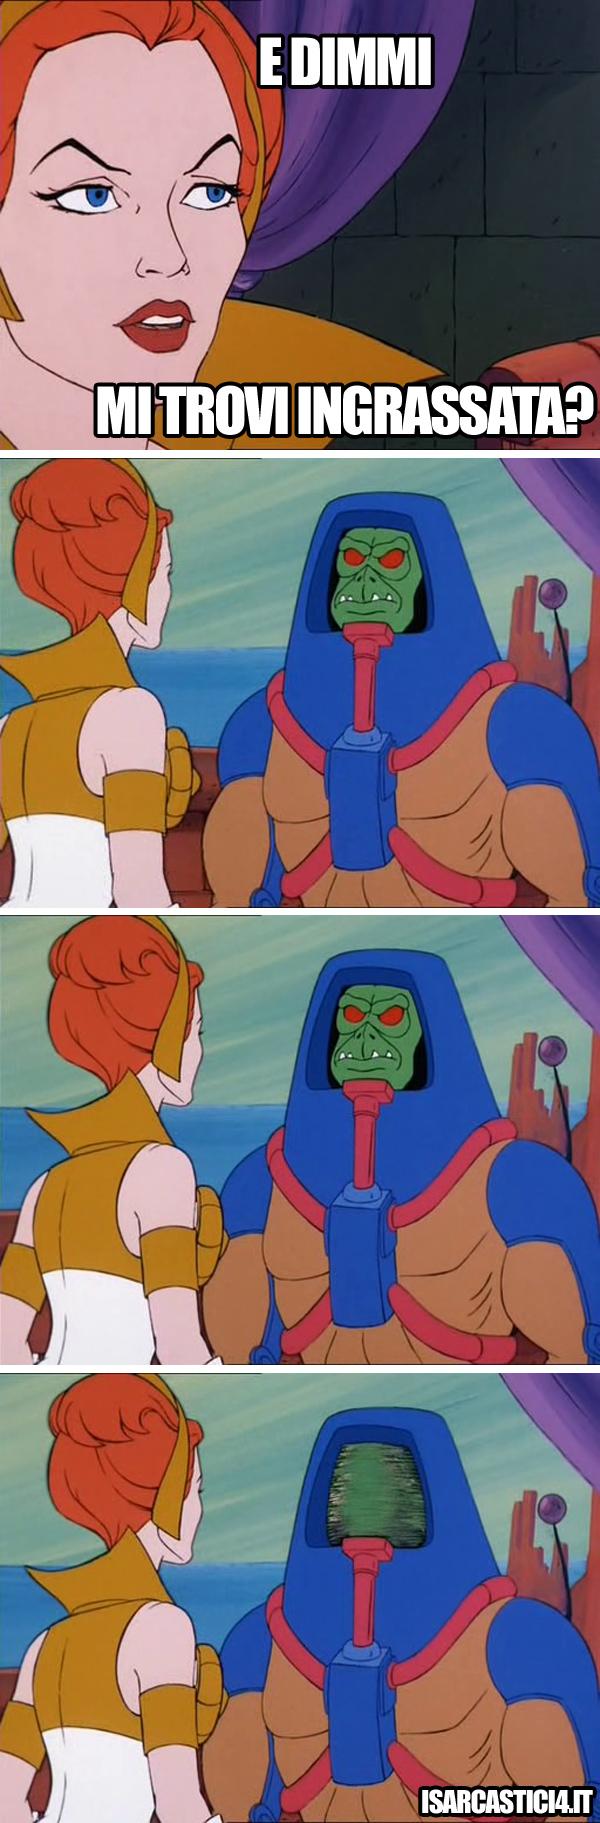 MOTU, Masters Of The Universe meme ita - Mi trovi ingrassata?